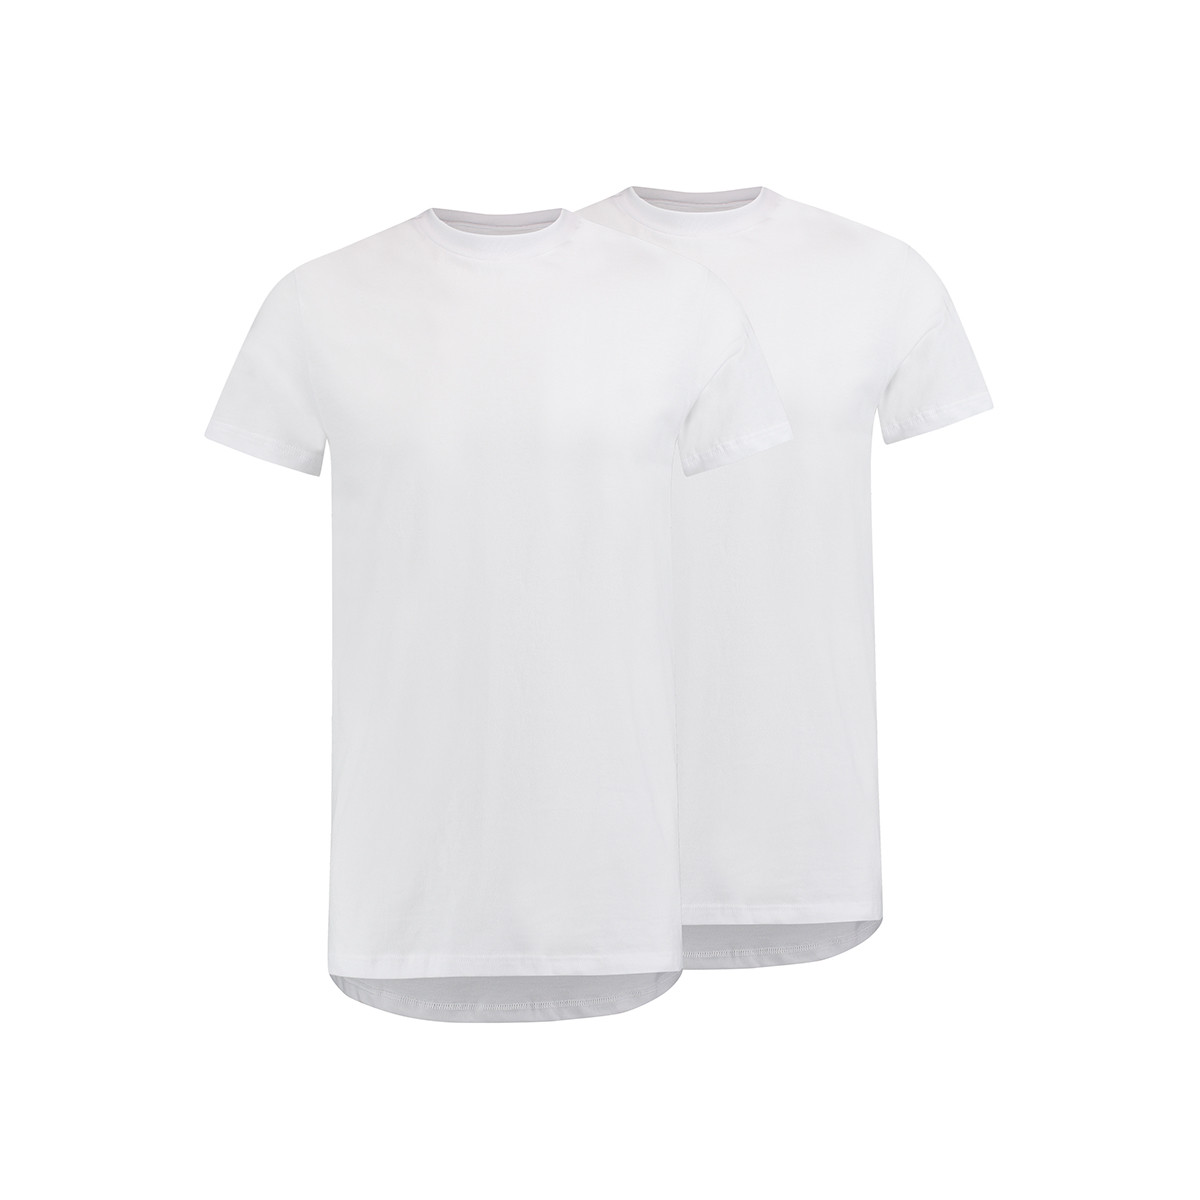 amsterdam o neck 2pack rj bodywear t-shirt wit